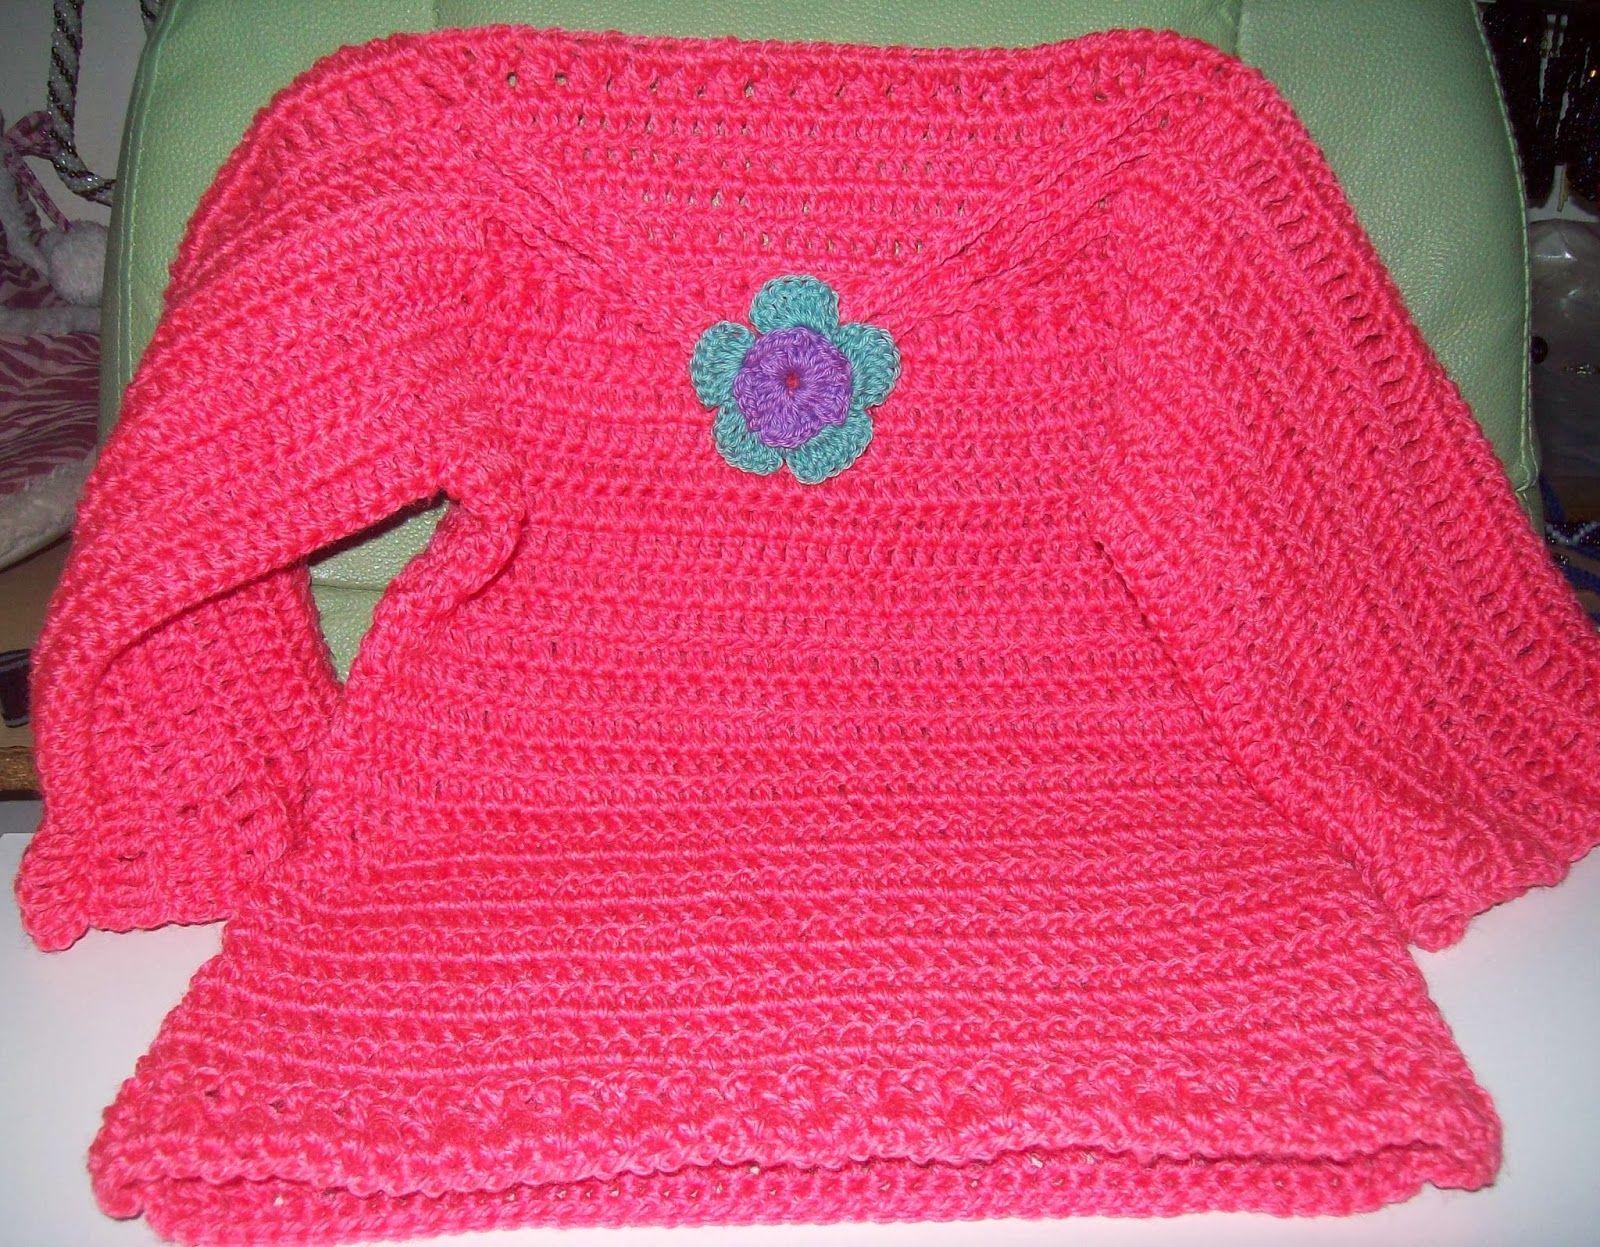 Cats rockin crochet free crochet patterns simple crochet toddler cats rockin crochet free crochet patterns simple crochet toddler sweater size 1 bankloansurffo Images